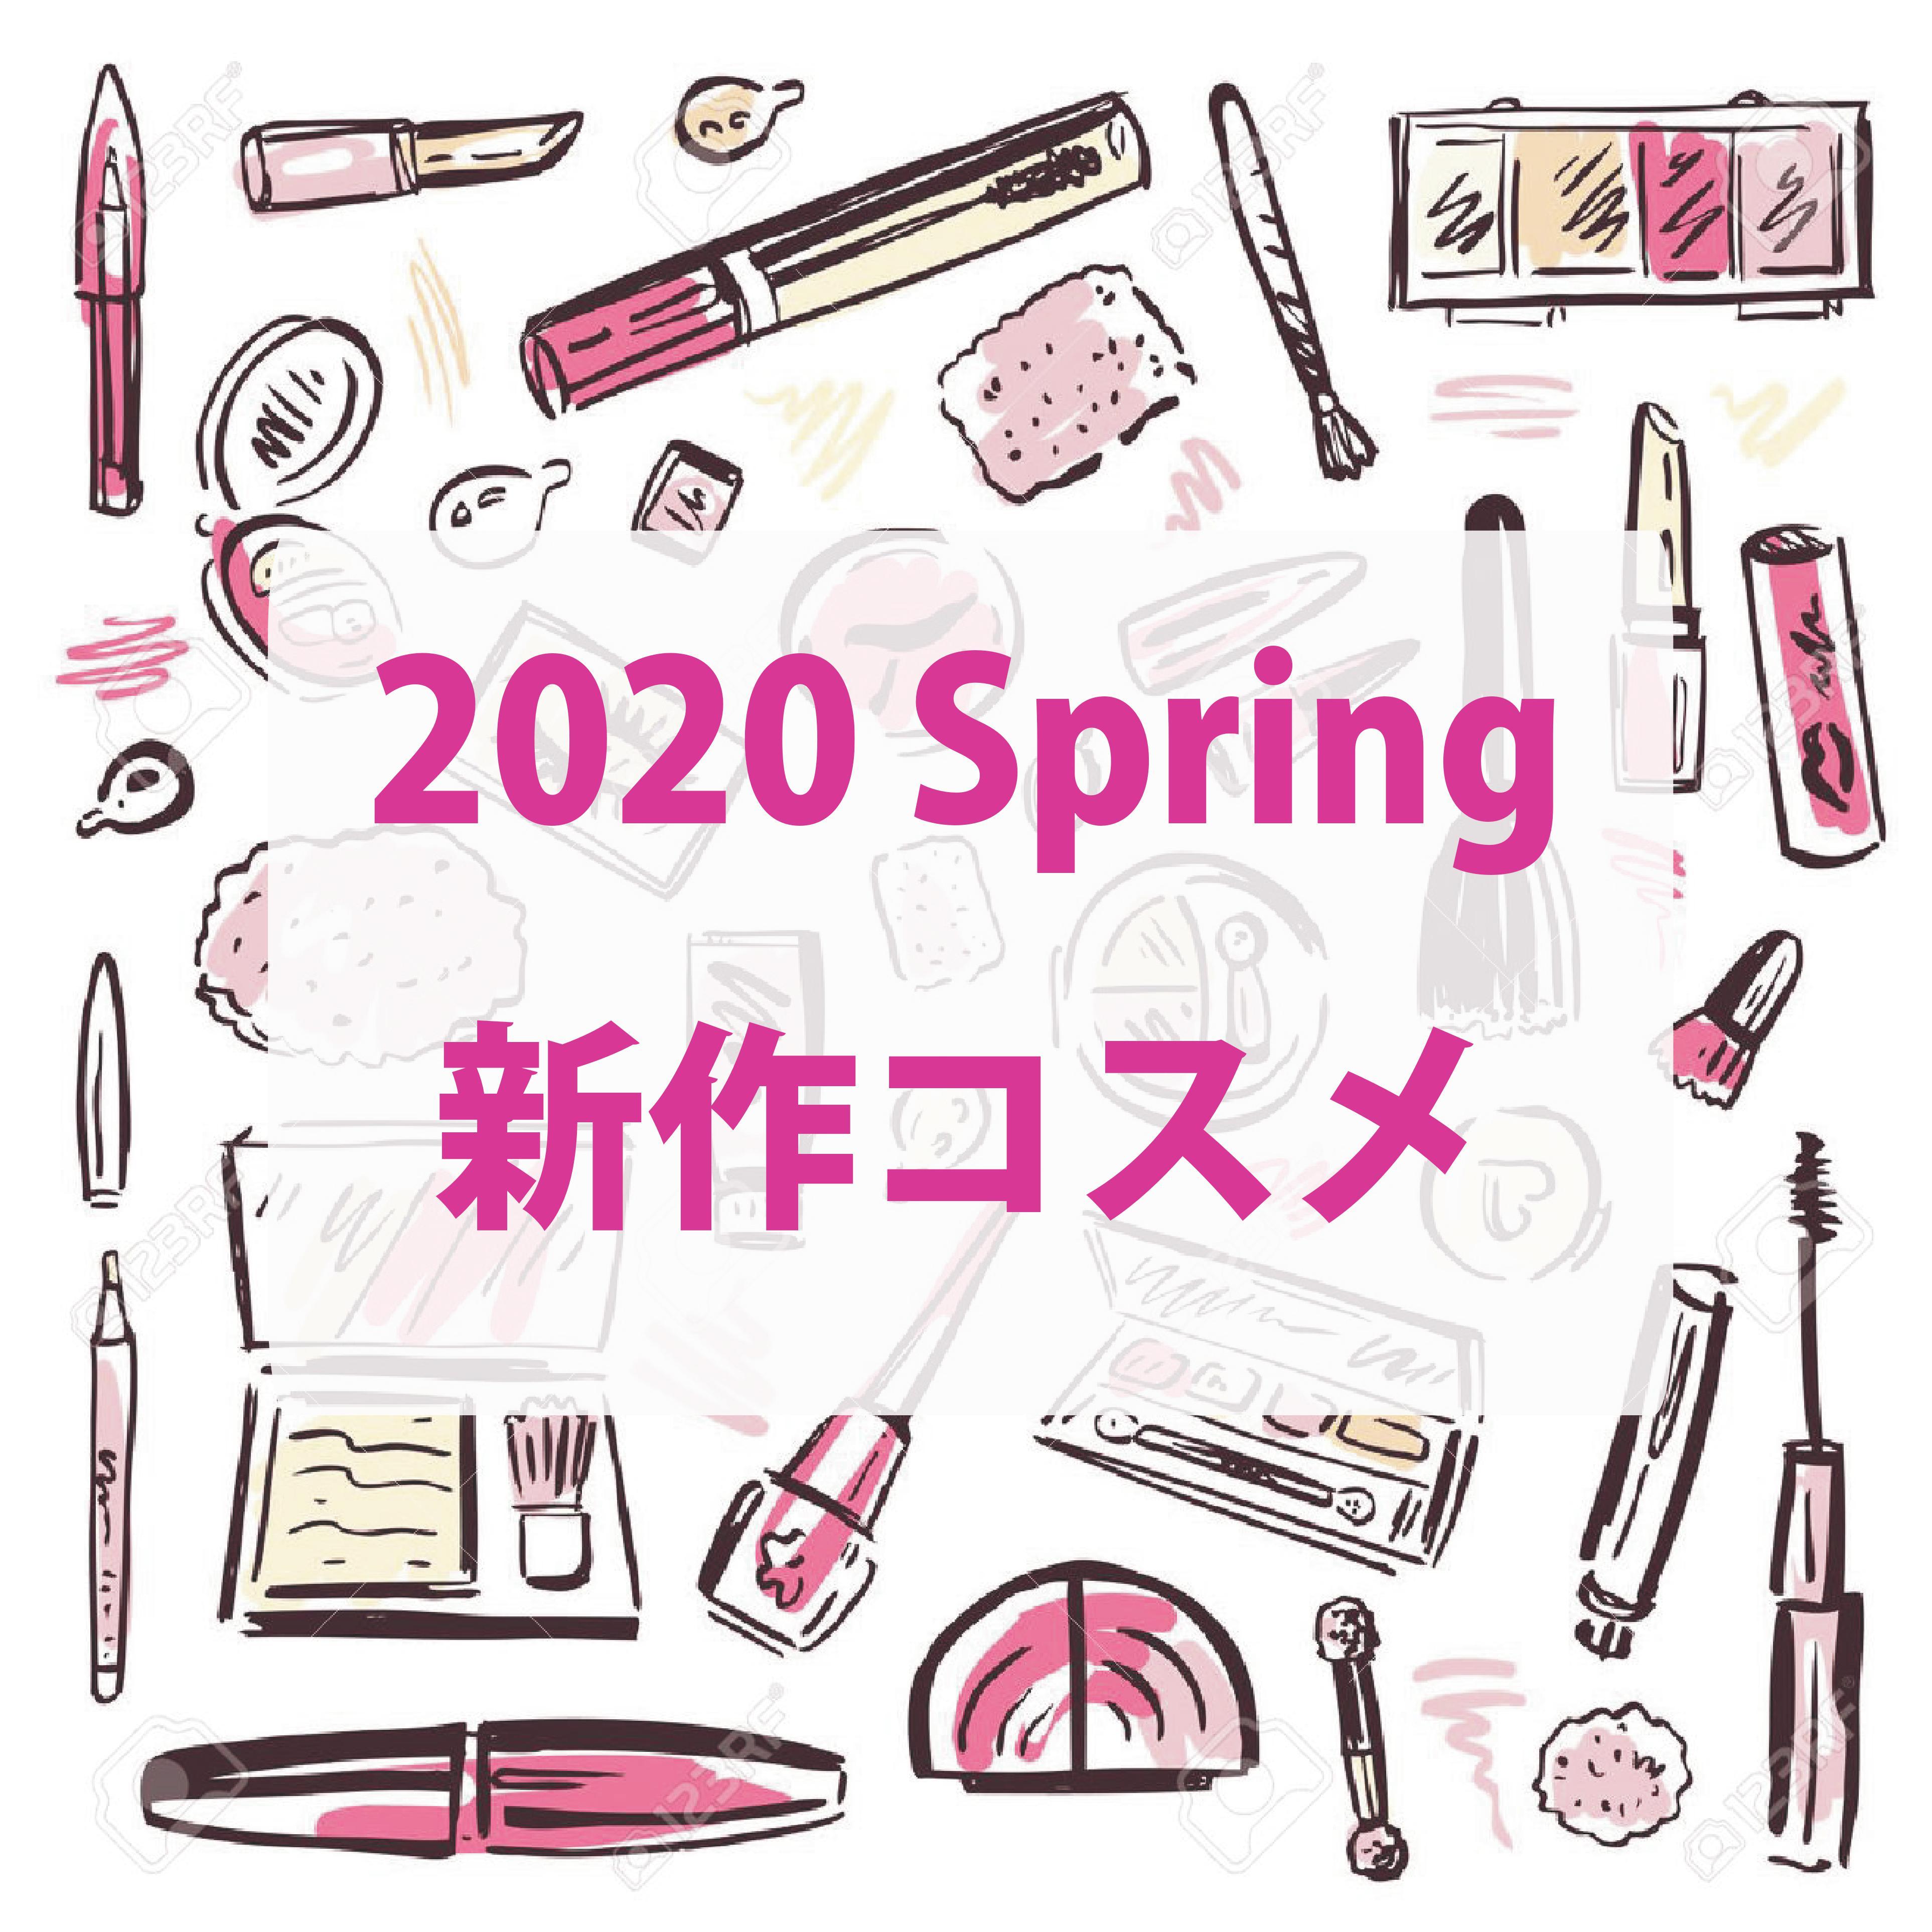 2020 Spring新作コスメ